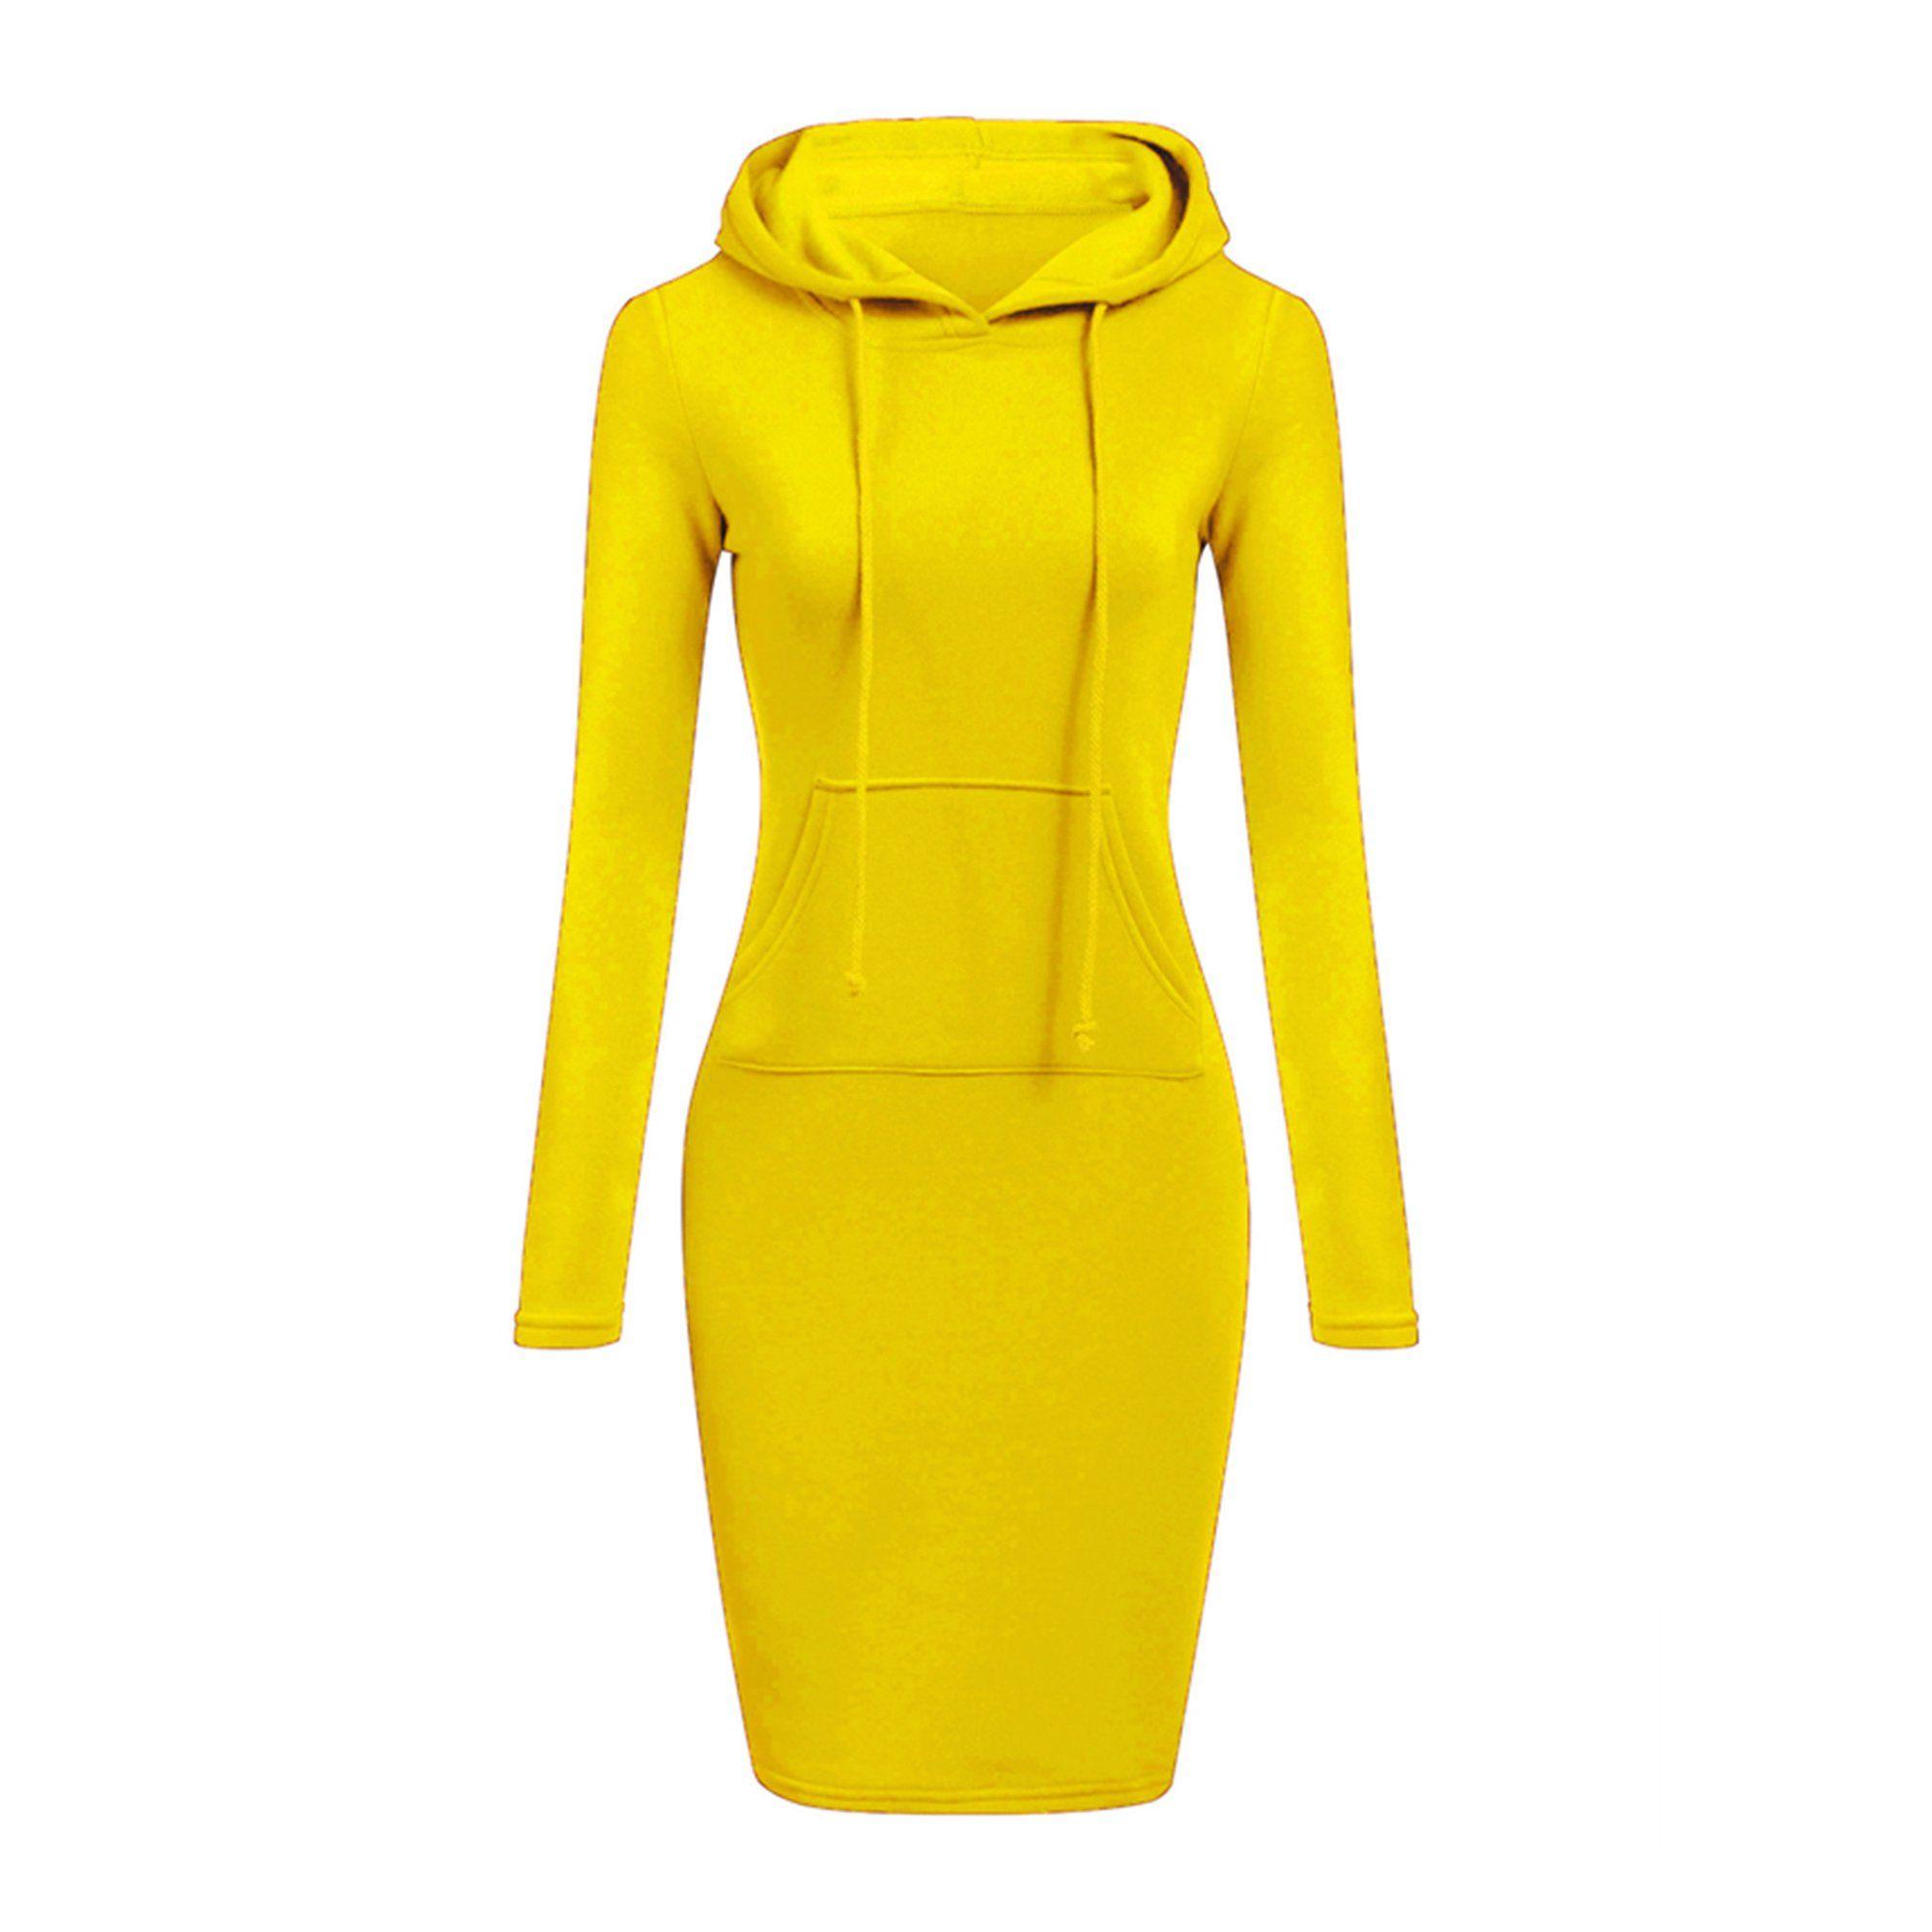 Wodstyle Womens Winter Drawstring Long Sleeve Slim Hoodie Dress Walmart Com Warm Sweatshirts Long Sweatshirt Hooded Dress [ 2000 x 2000 Pixel ]